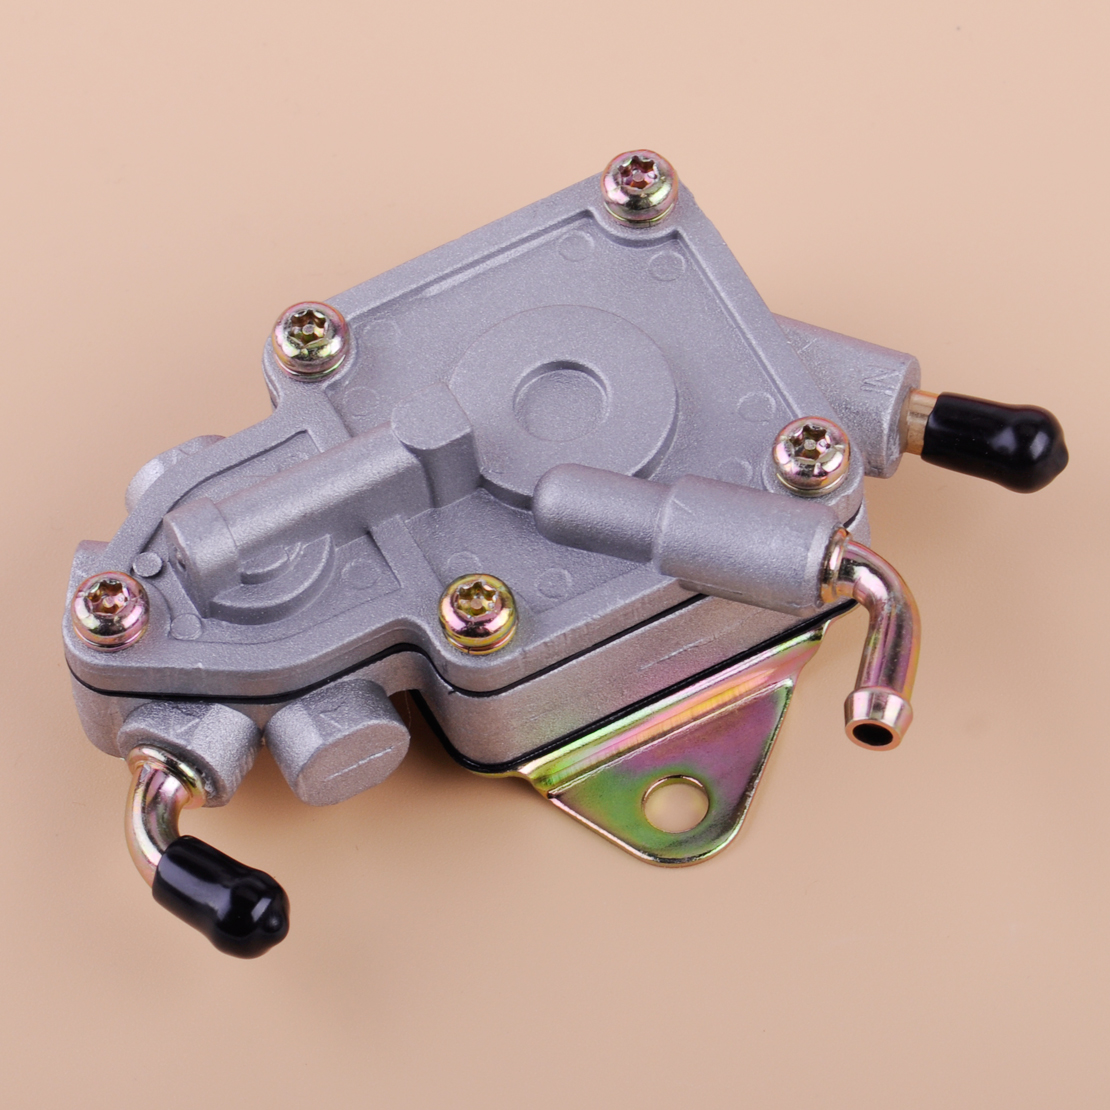 Good quality and cheap buyang atv 300cc in Store Sish